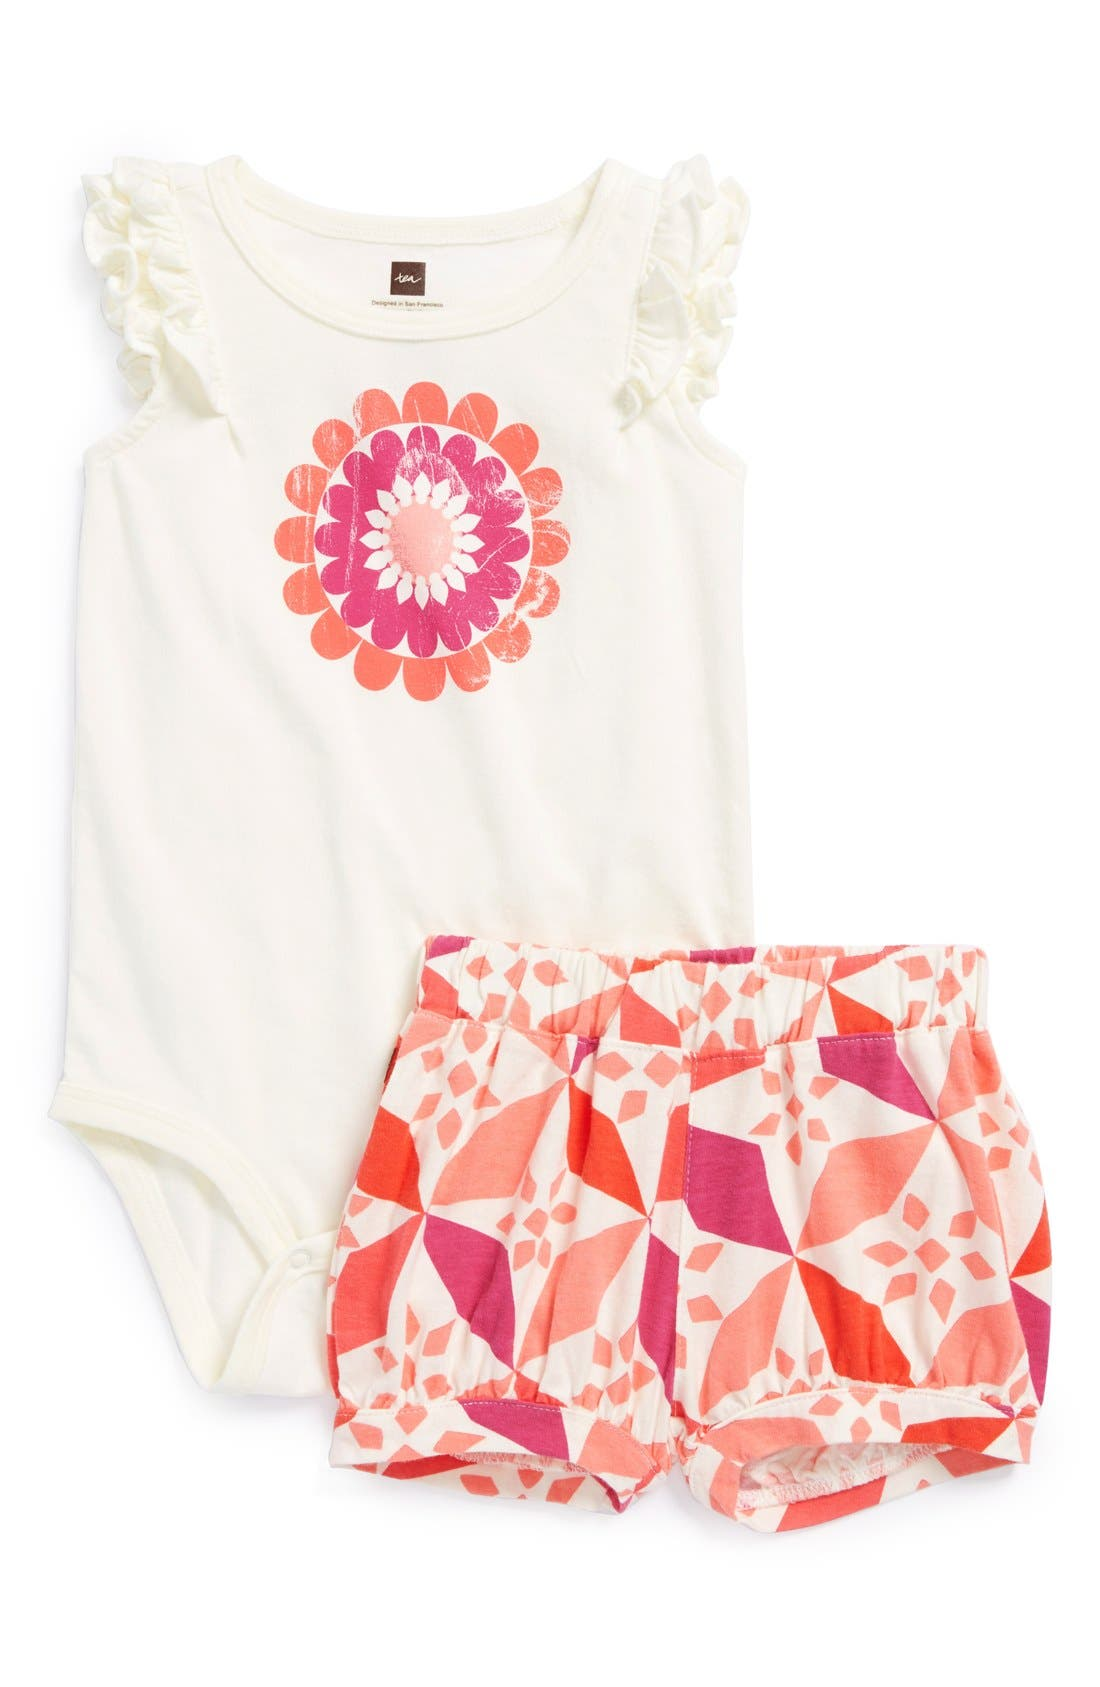 Alternate Image 1 Selected - Tea Collection 'Rabat Tile' Flutter Sleeve Bodysuit & Shorts (Baby Girls)